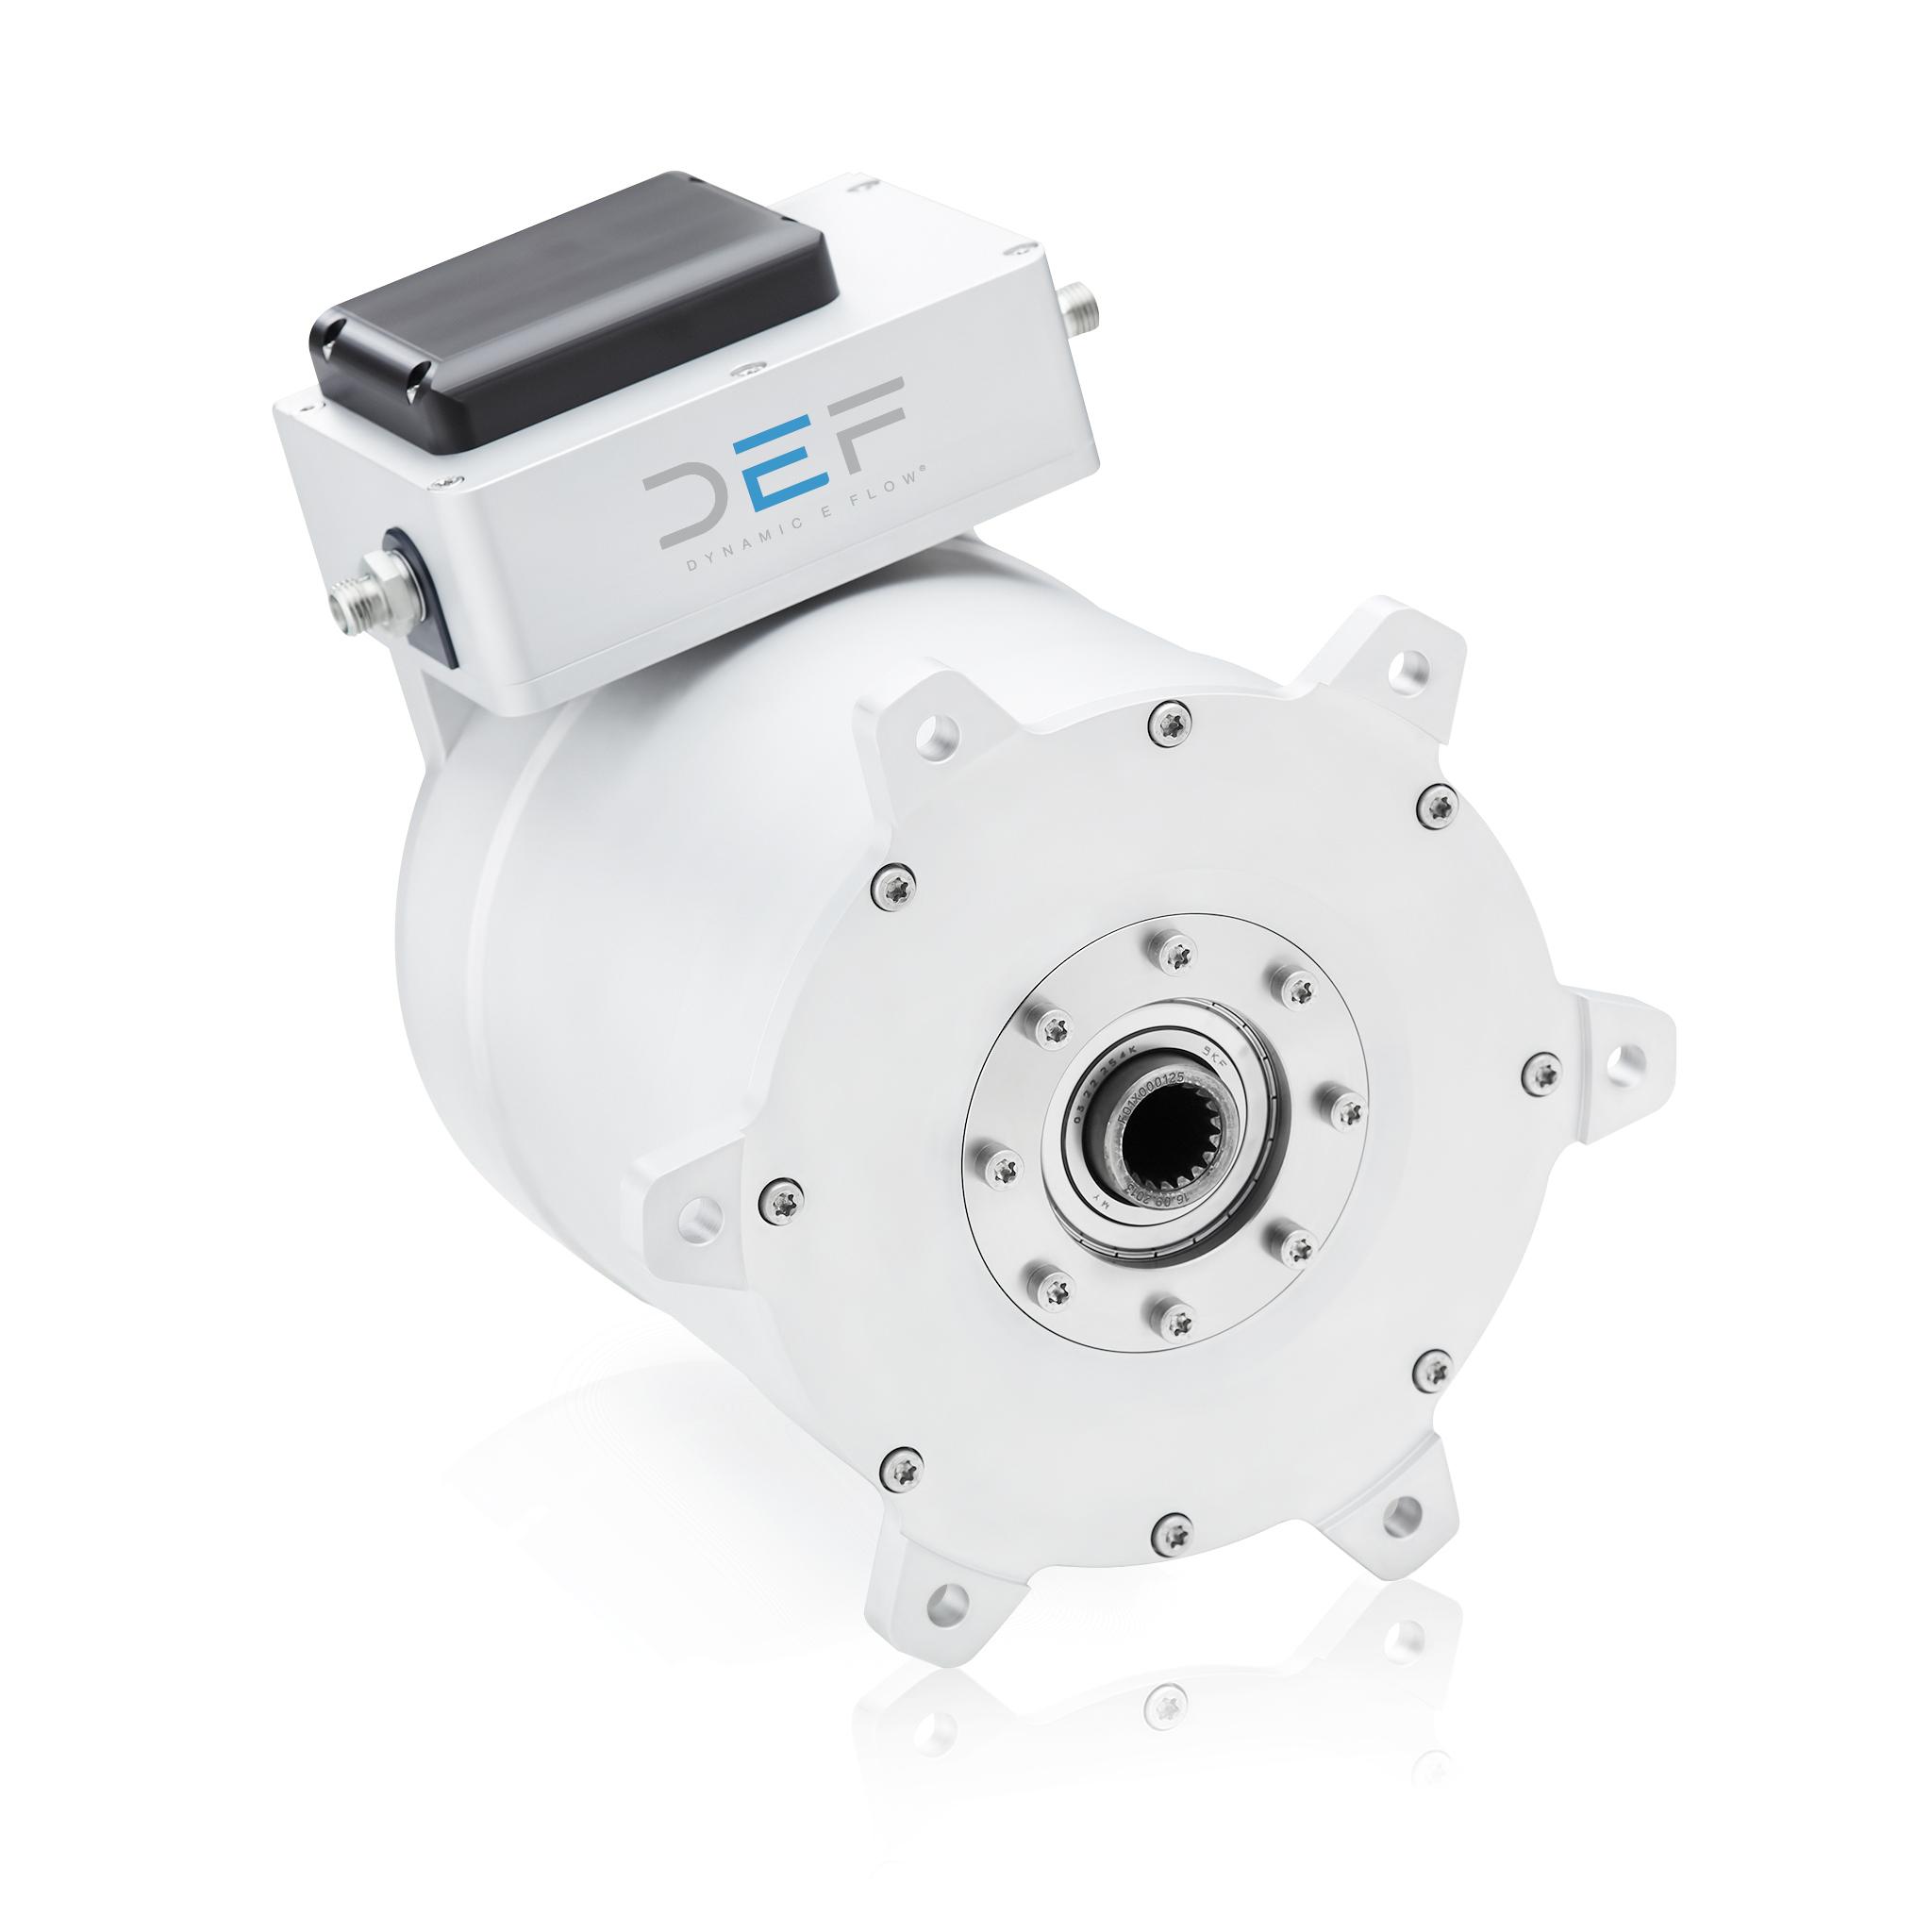 ….  © dynamic E flow, Neues HC Elektromotorsystem mit integrierter capcooltech®  ..  © dynamic E flow, New HC Electric Motor System with integrated capcooltech®  ….